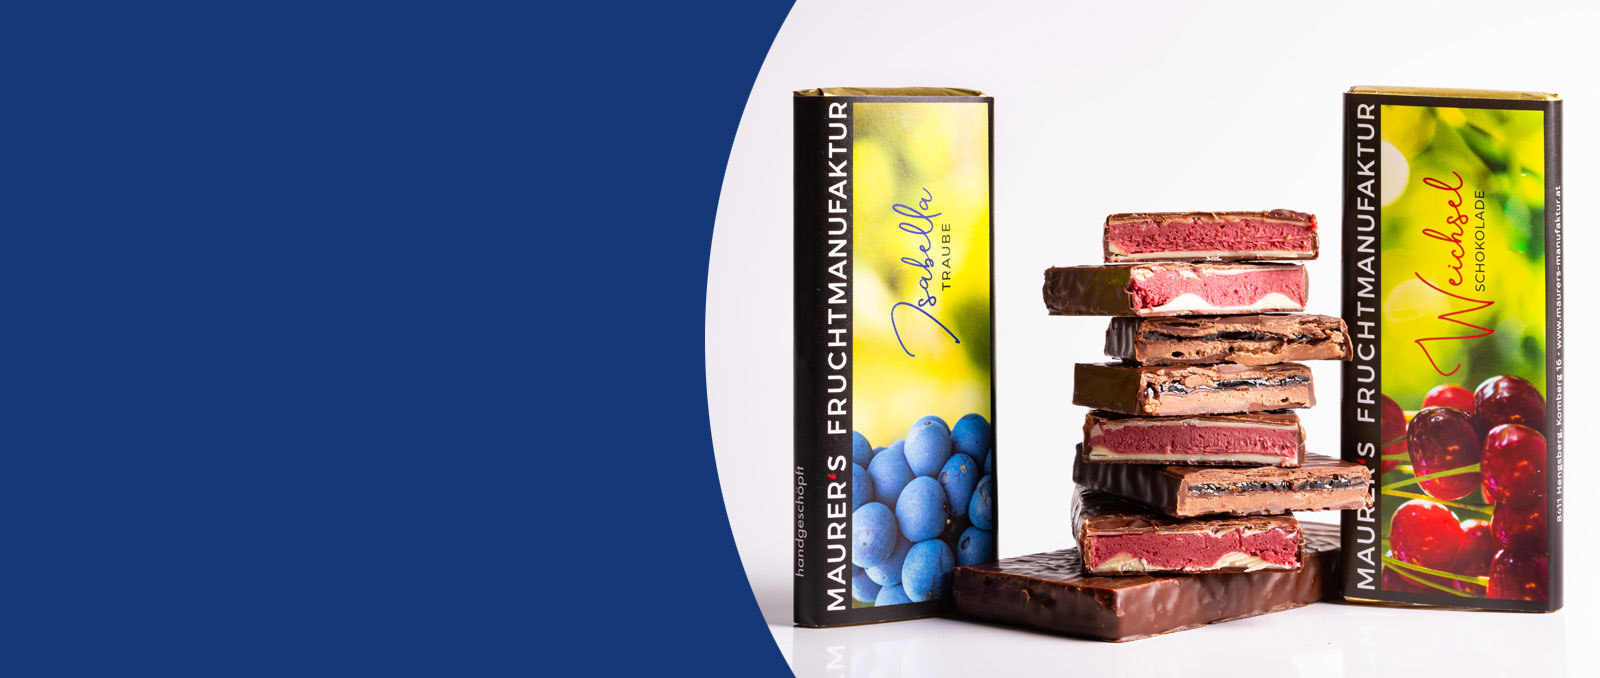 slider-schokolade-maurers-fruchtmanufaktur